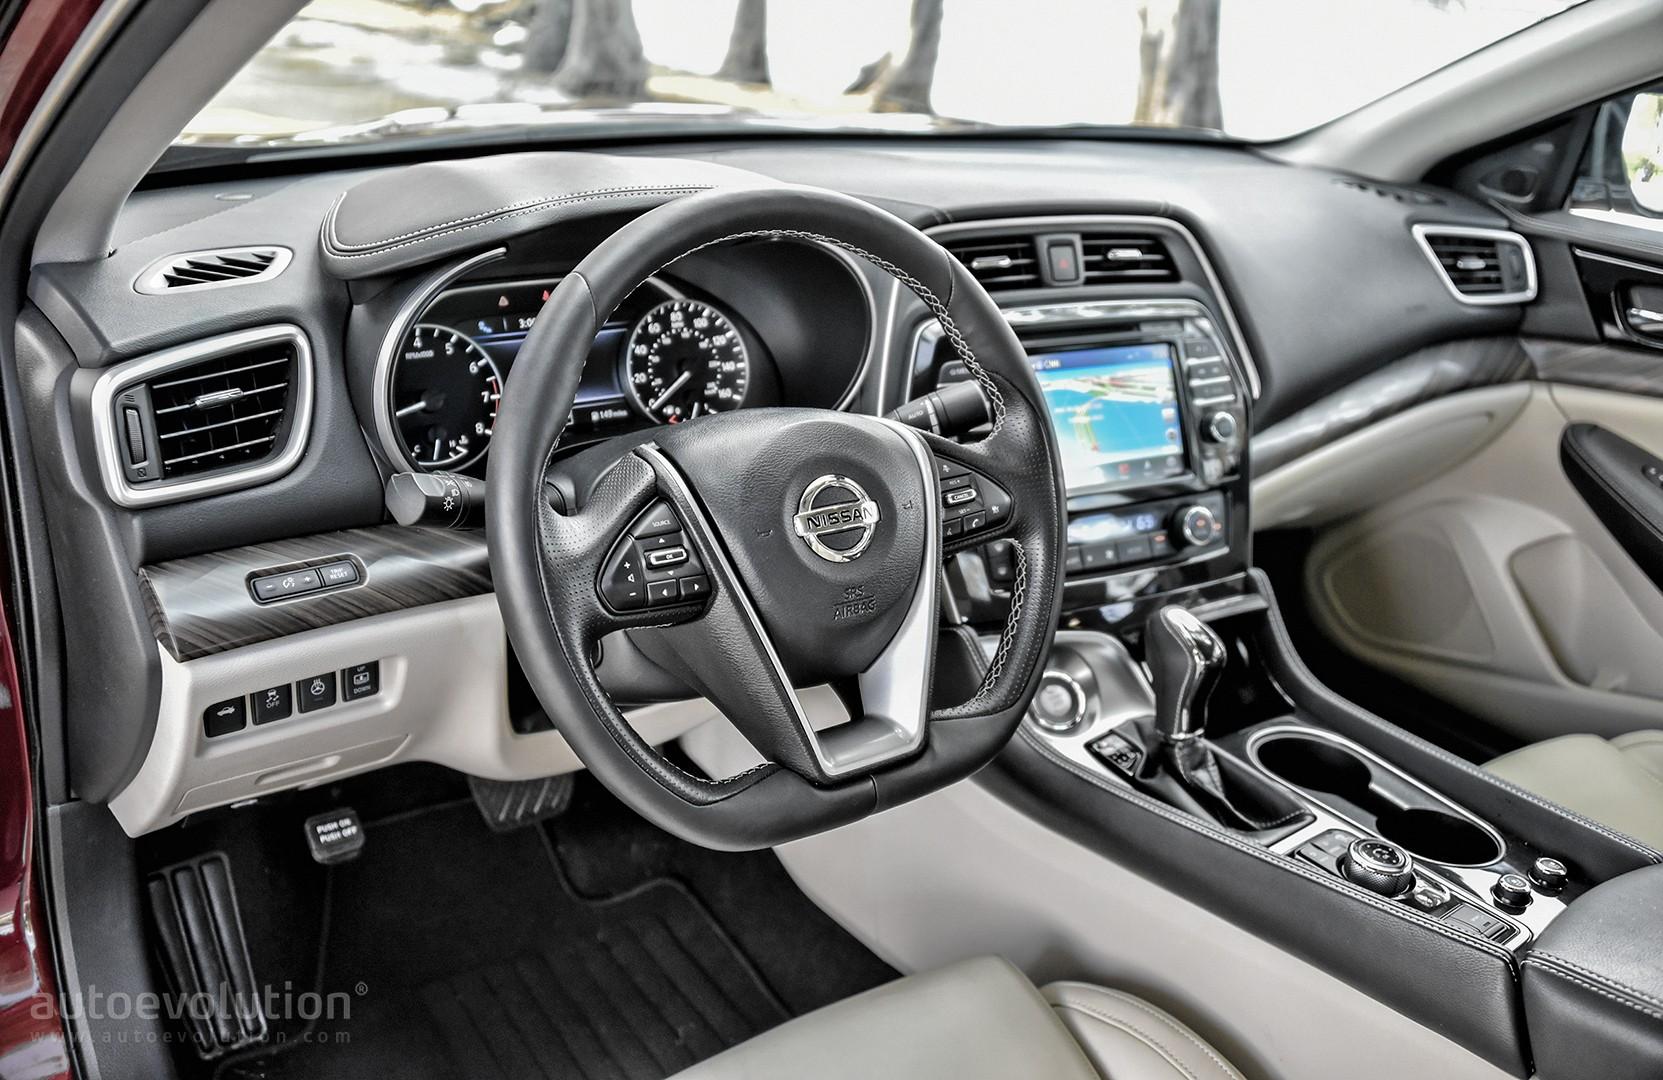 2016 Bmw 328i >> 2016 Nissan Maxima Review - autoevolution